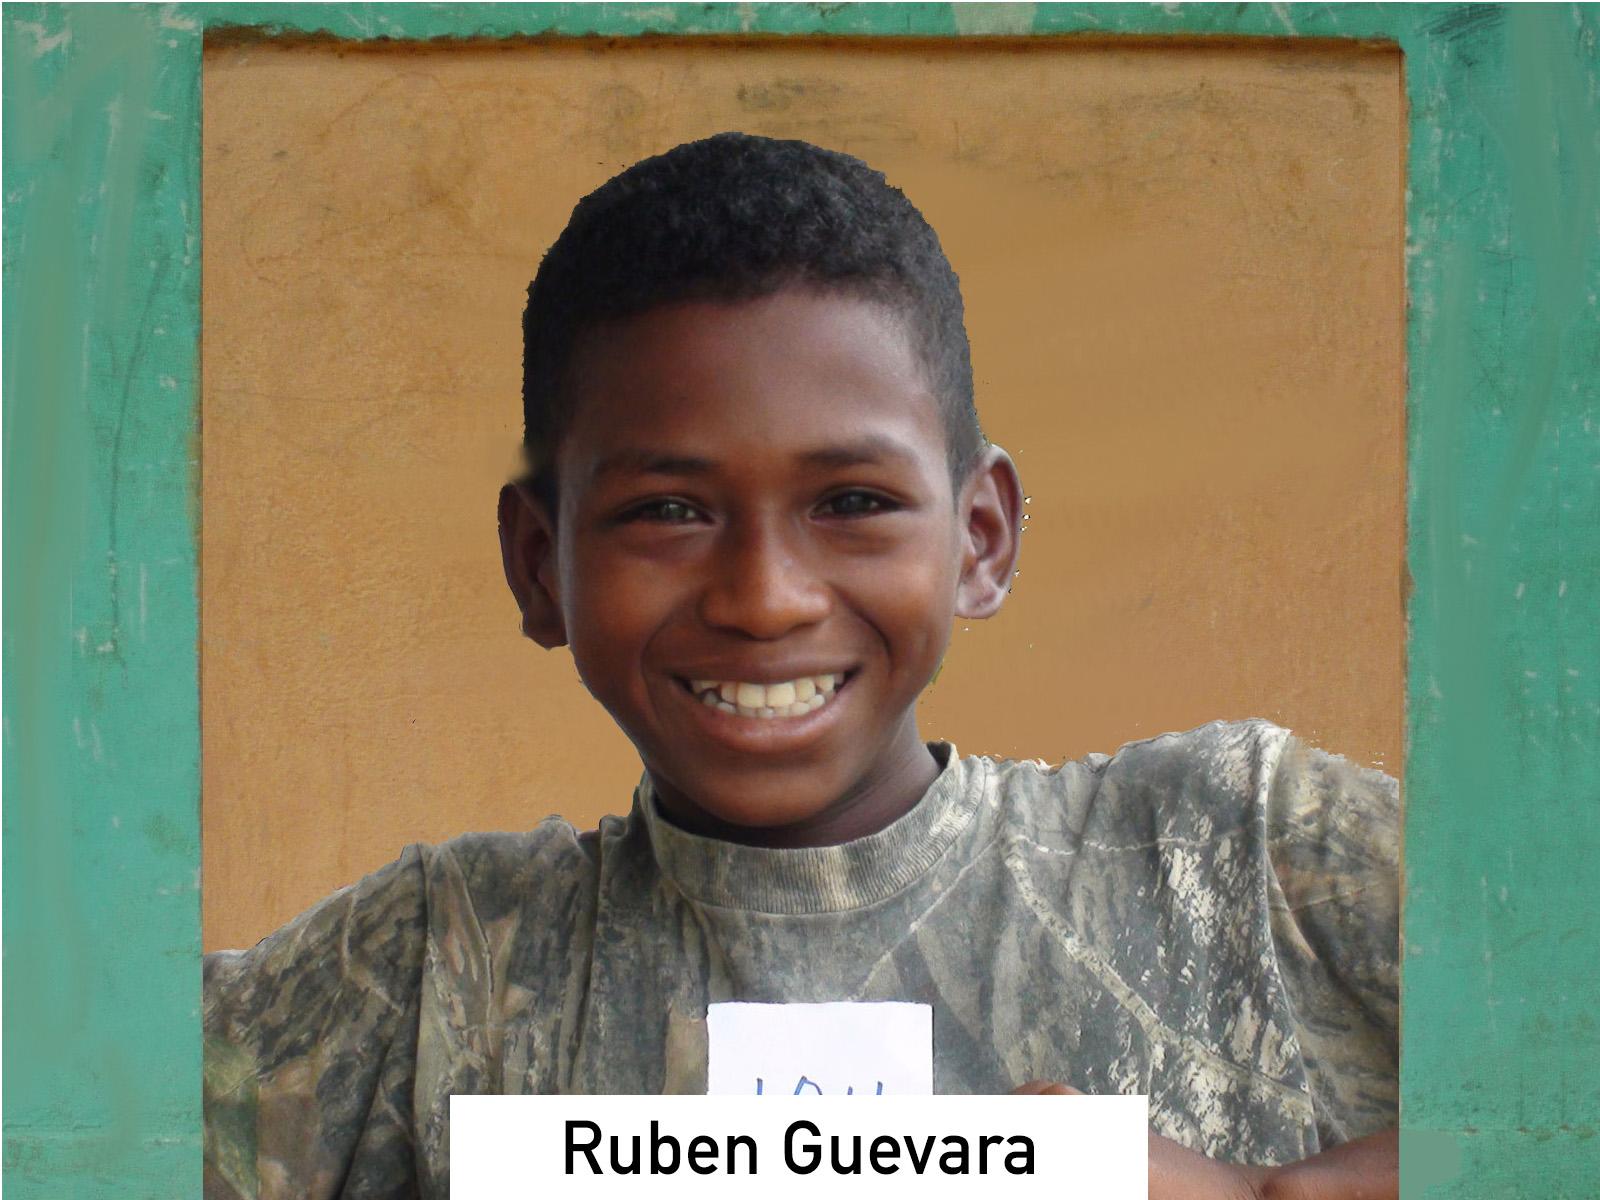 104 - Ruben Guevara.jpg